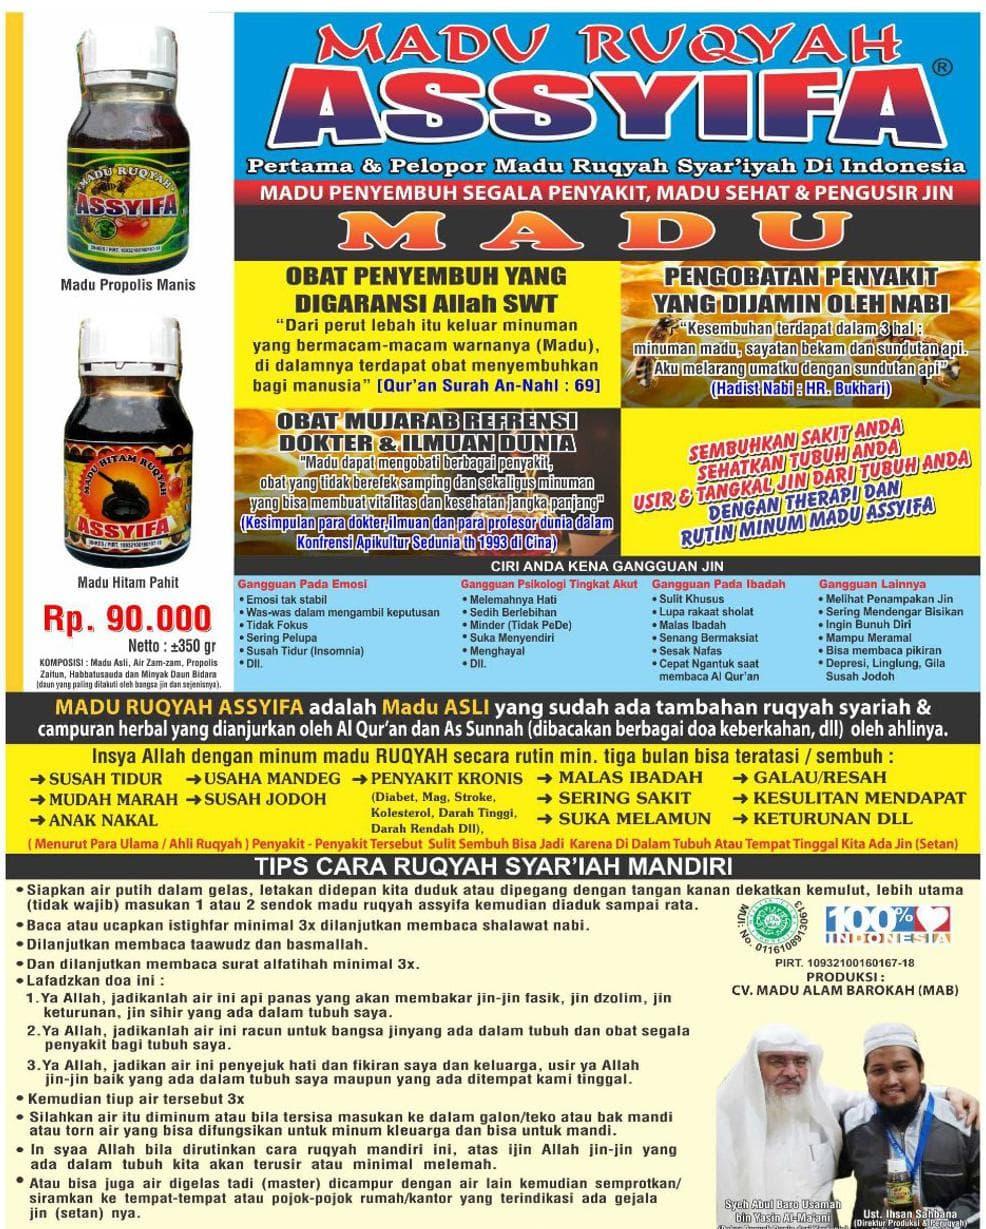 Jual MADU RUQYAH ASSYIFA - DKI Jakarta - fahroni shop